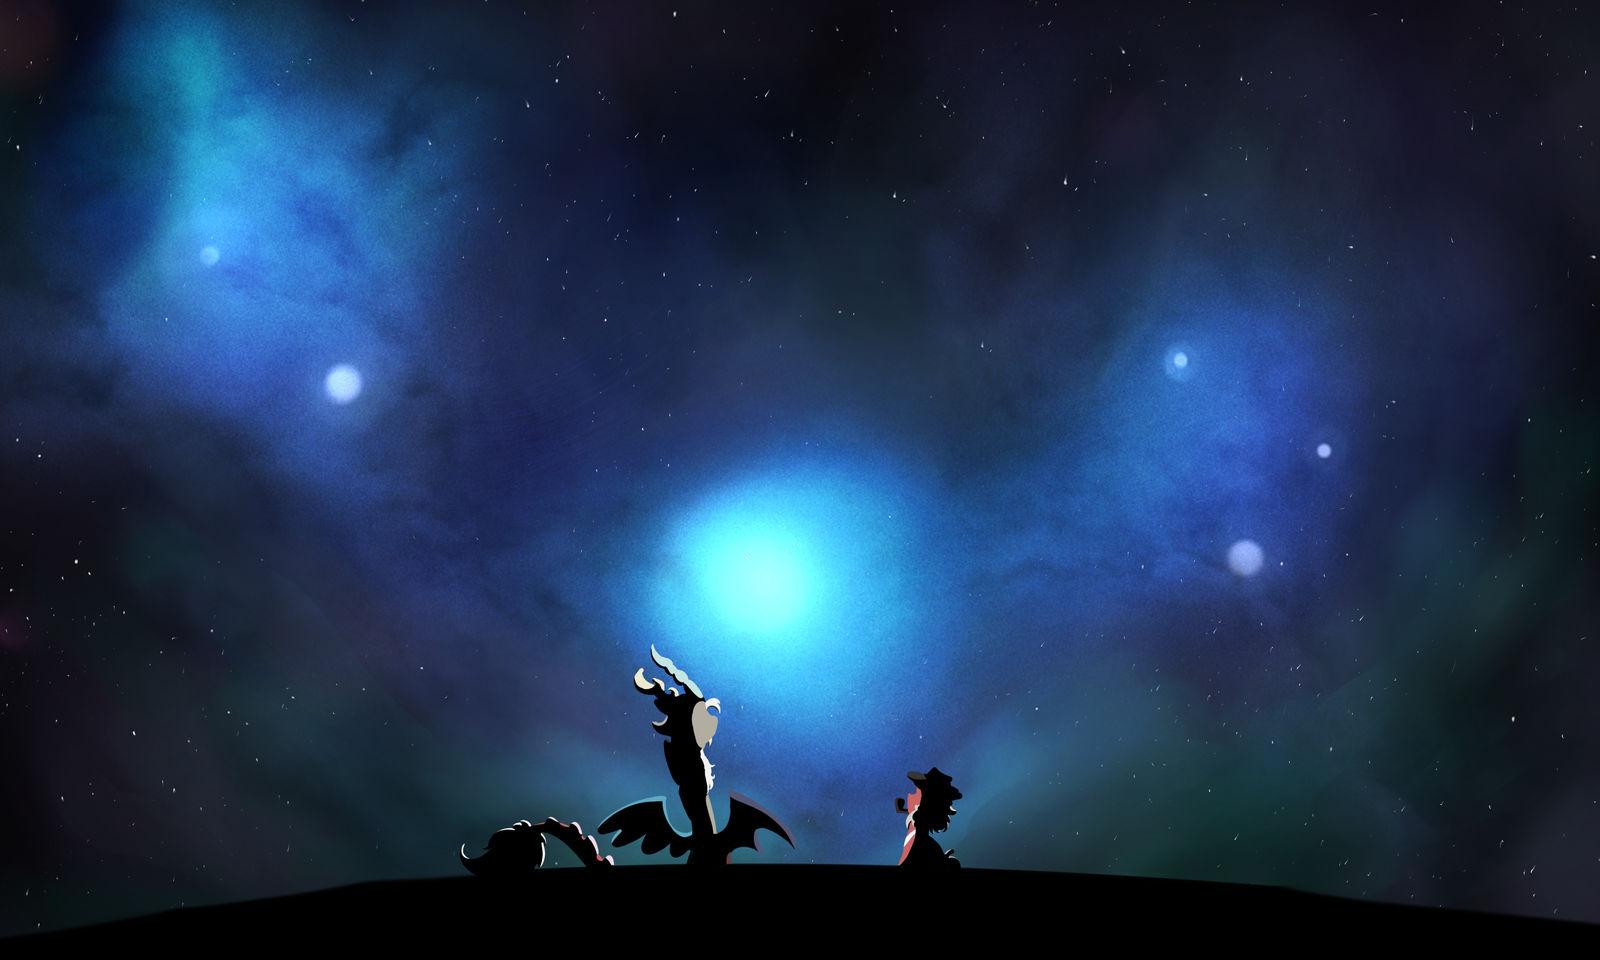 Nebulagazing